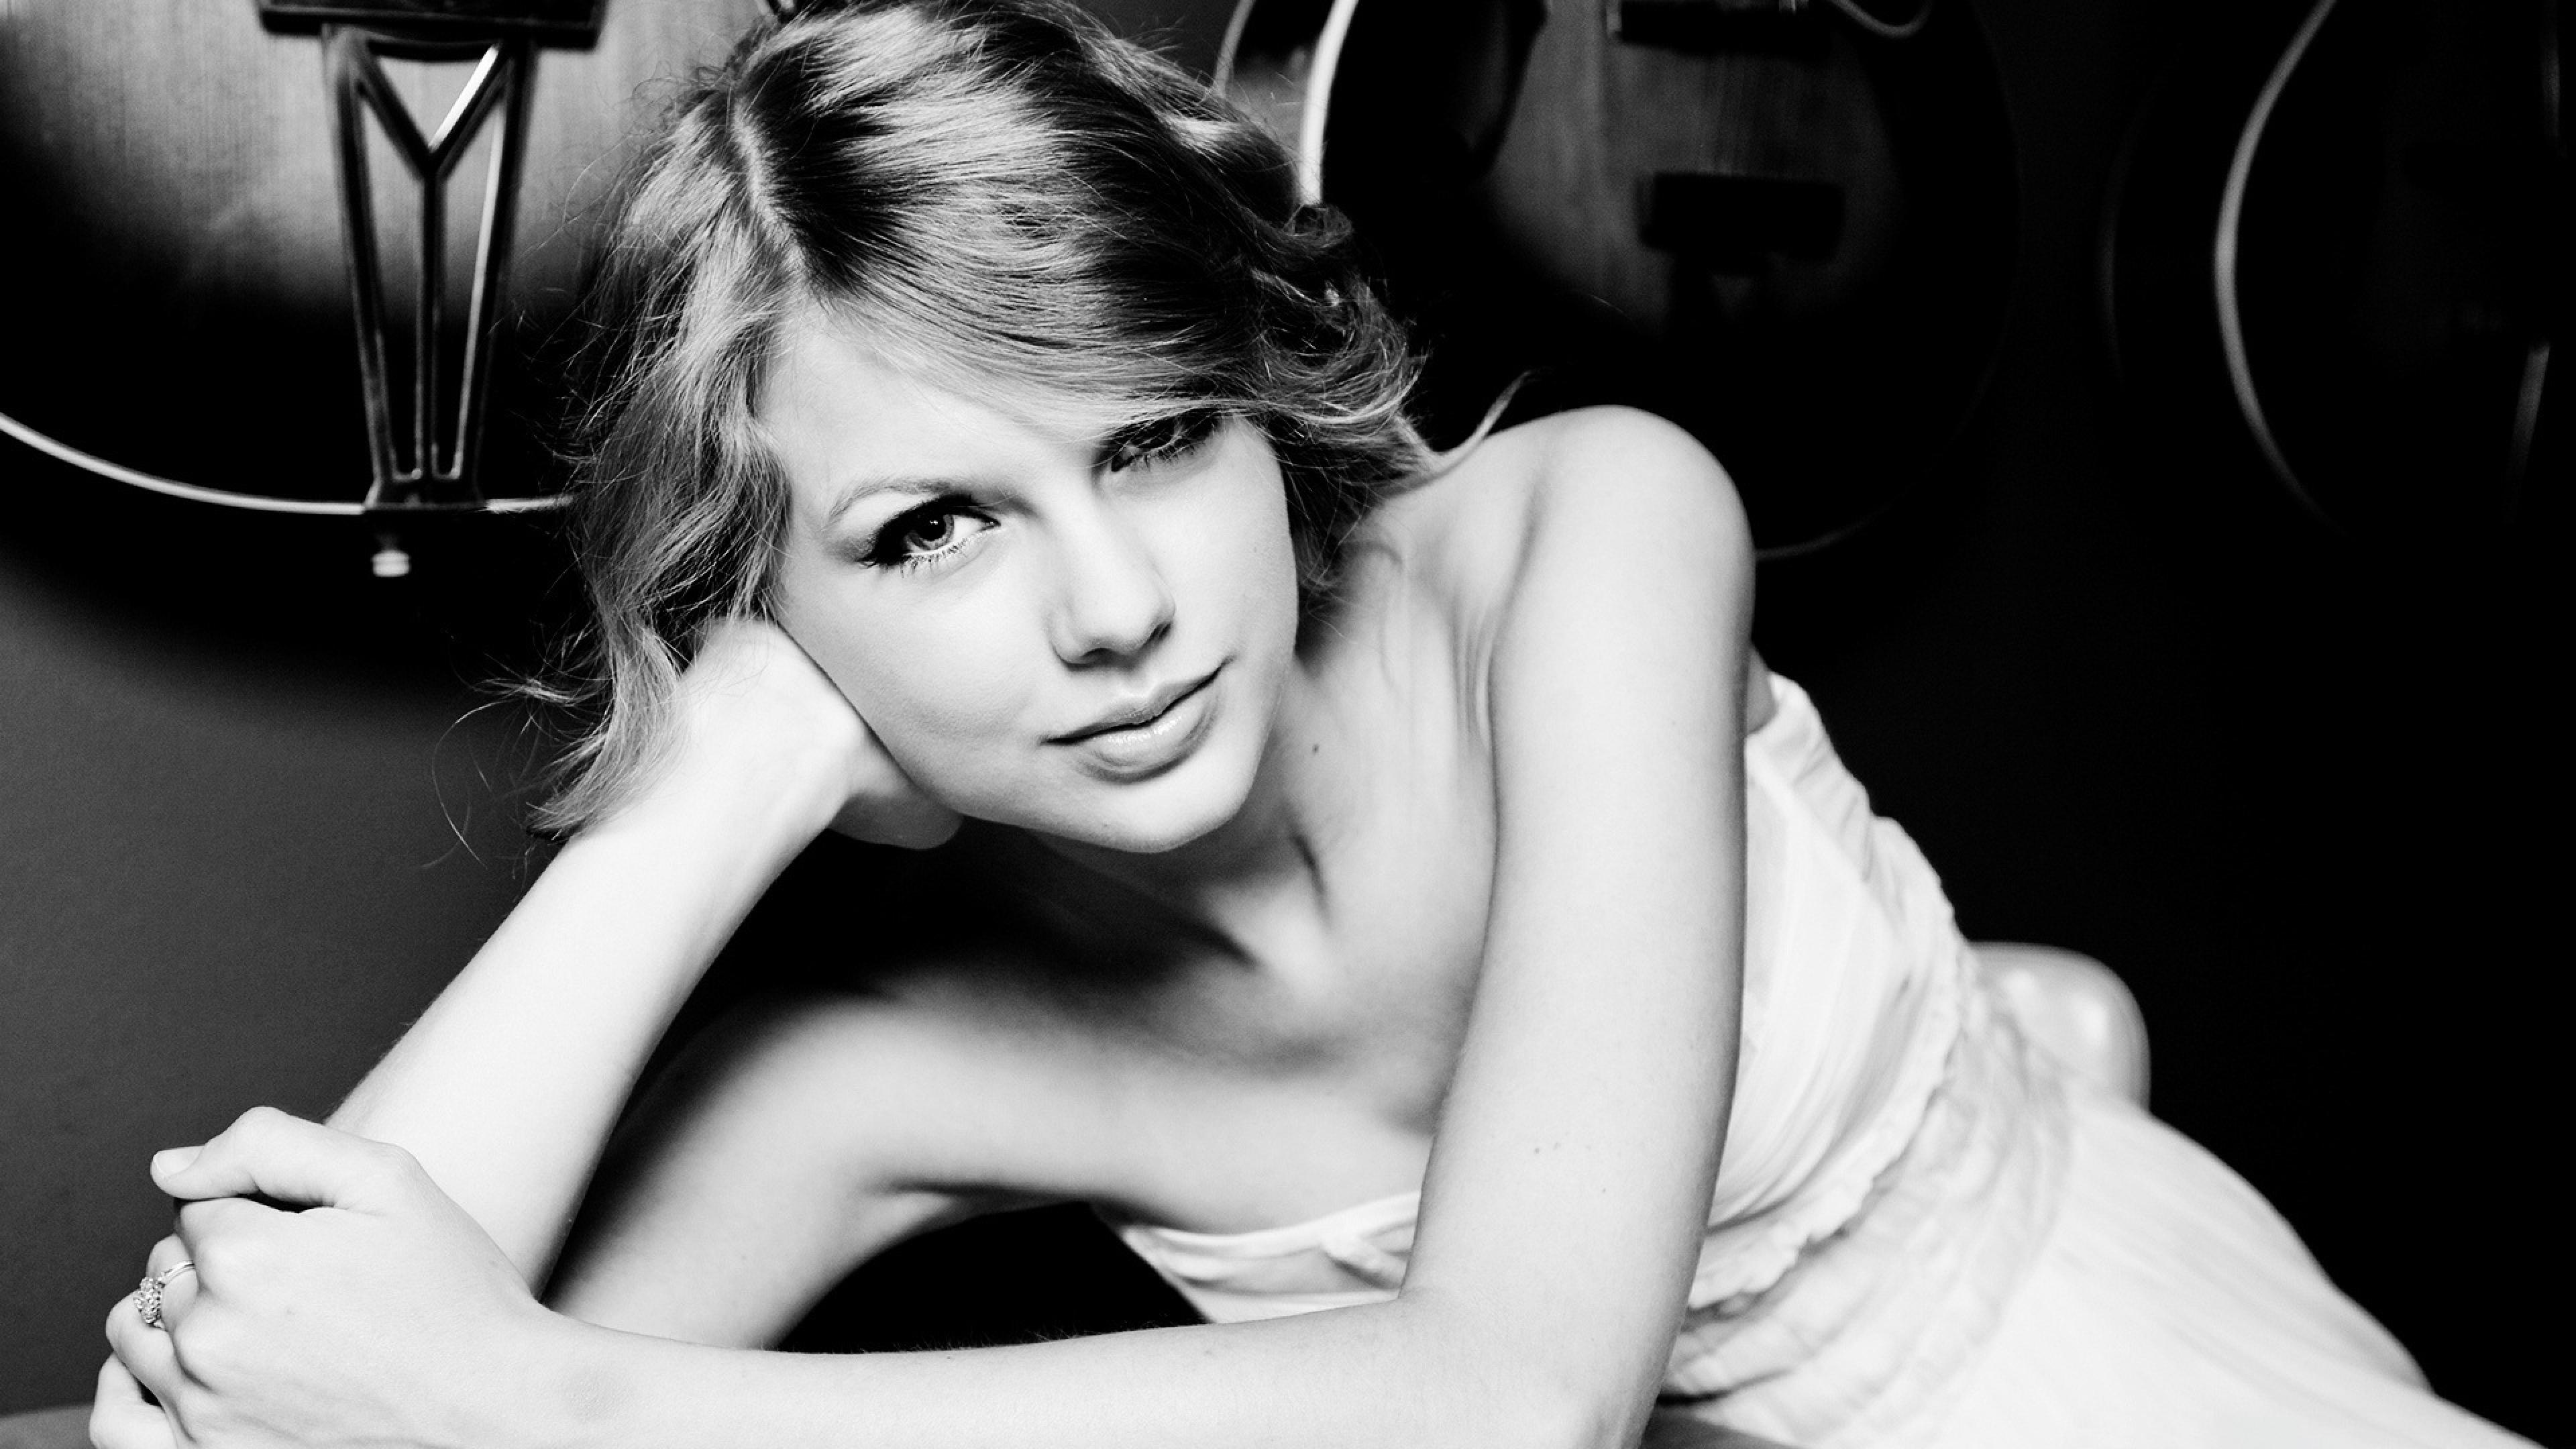 taylor swift 3 1536855377 - Taylor Swift 3 - taylor swift wallpapers, singer wallpapers, music wallpapers, celebrities wallpapers